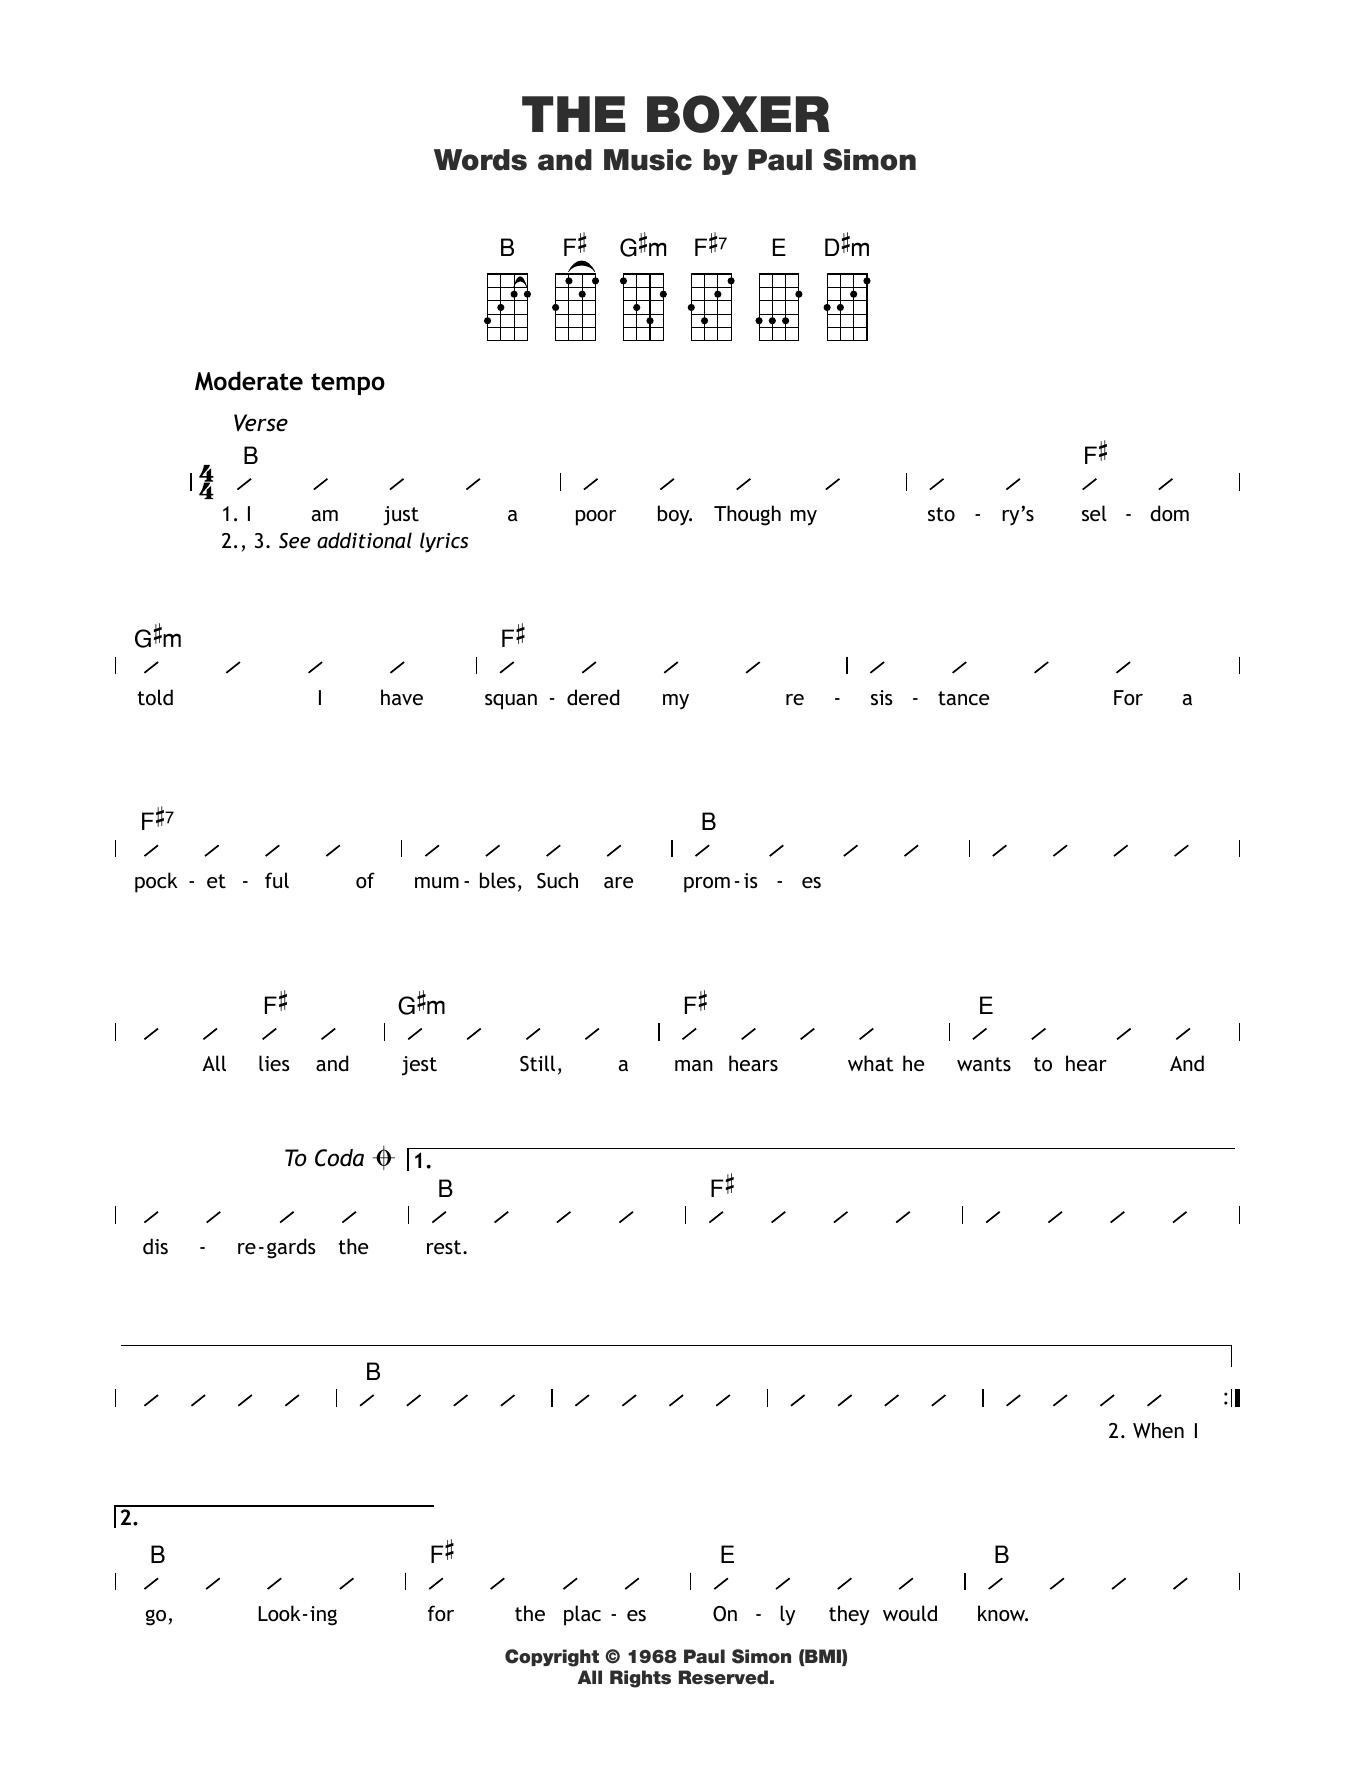 The Boxer Sheet Music